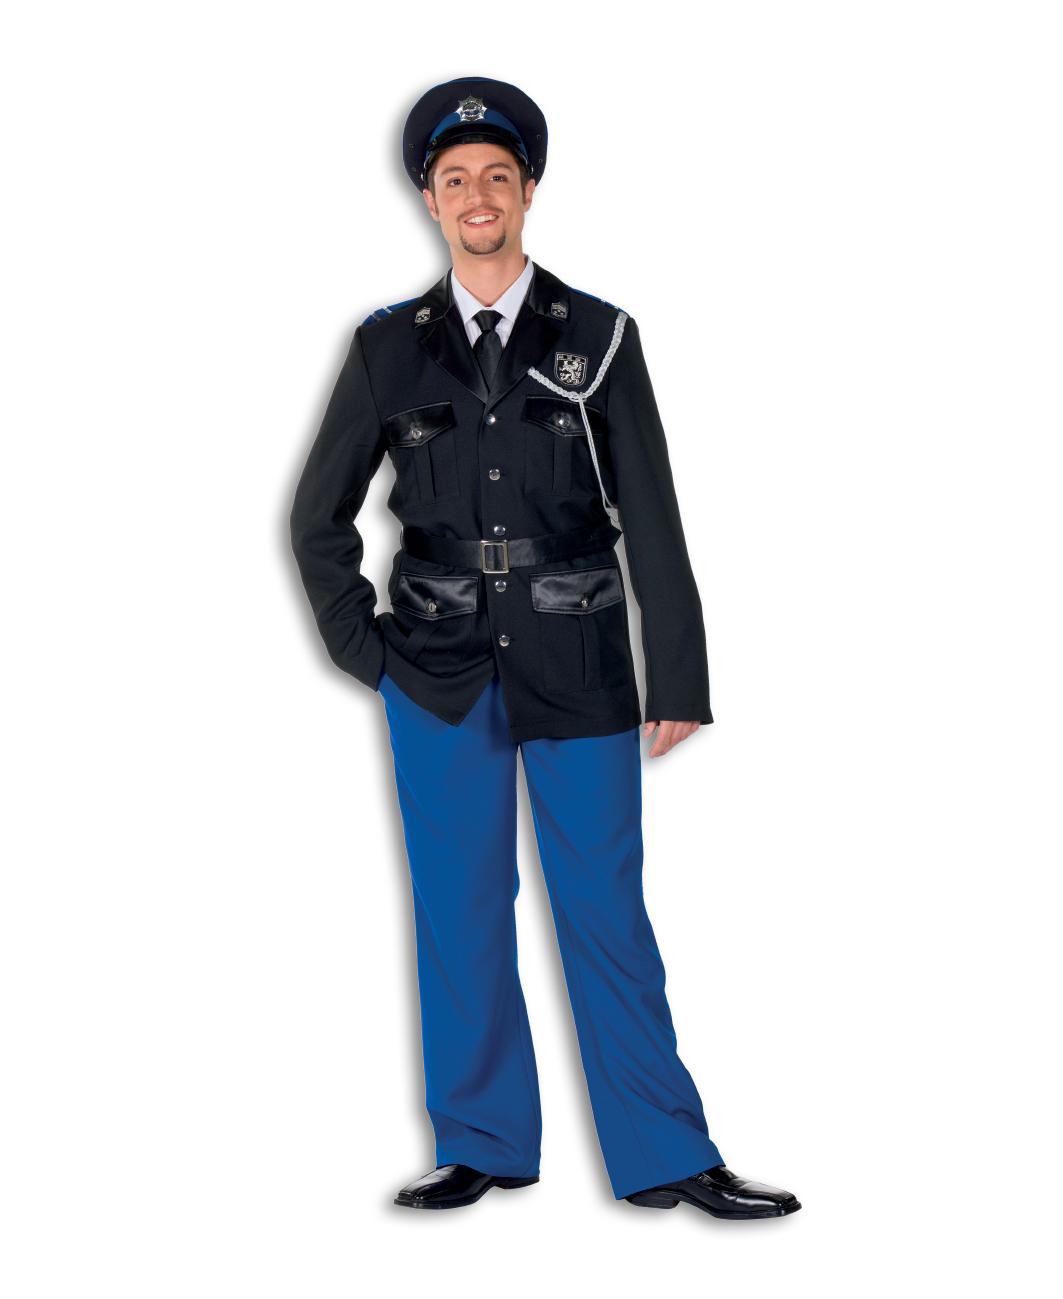 Politie uniform-0